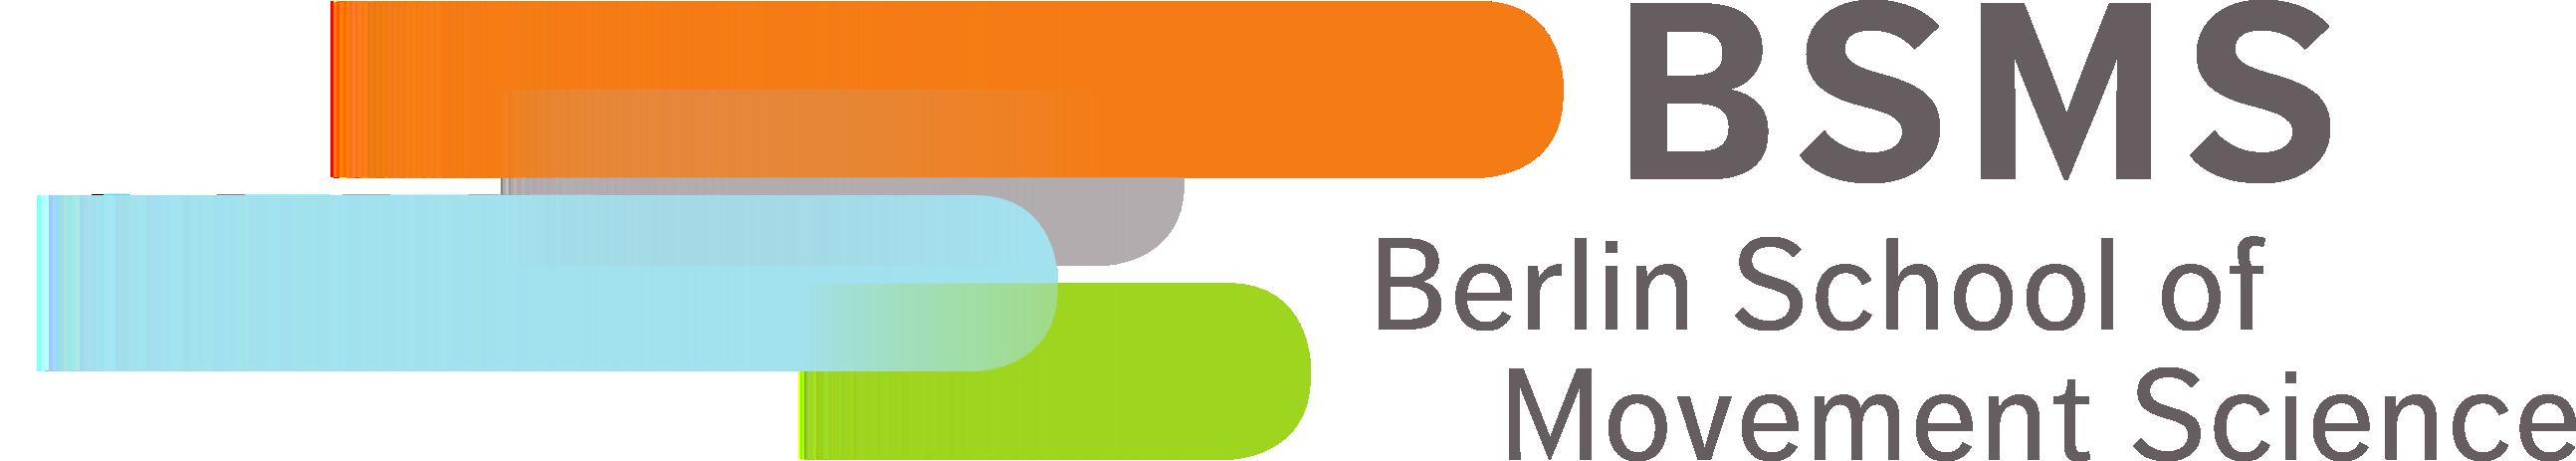 BSMS_logo.png